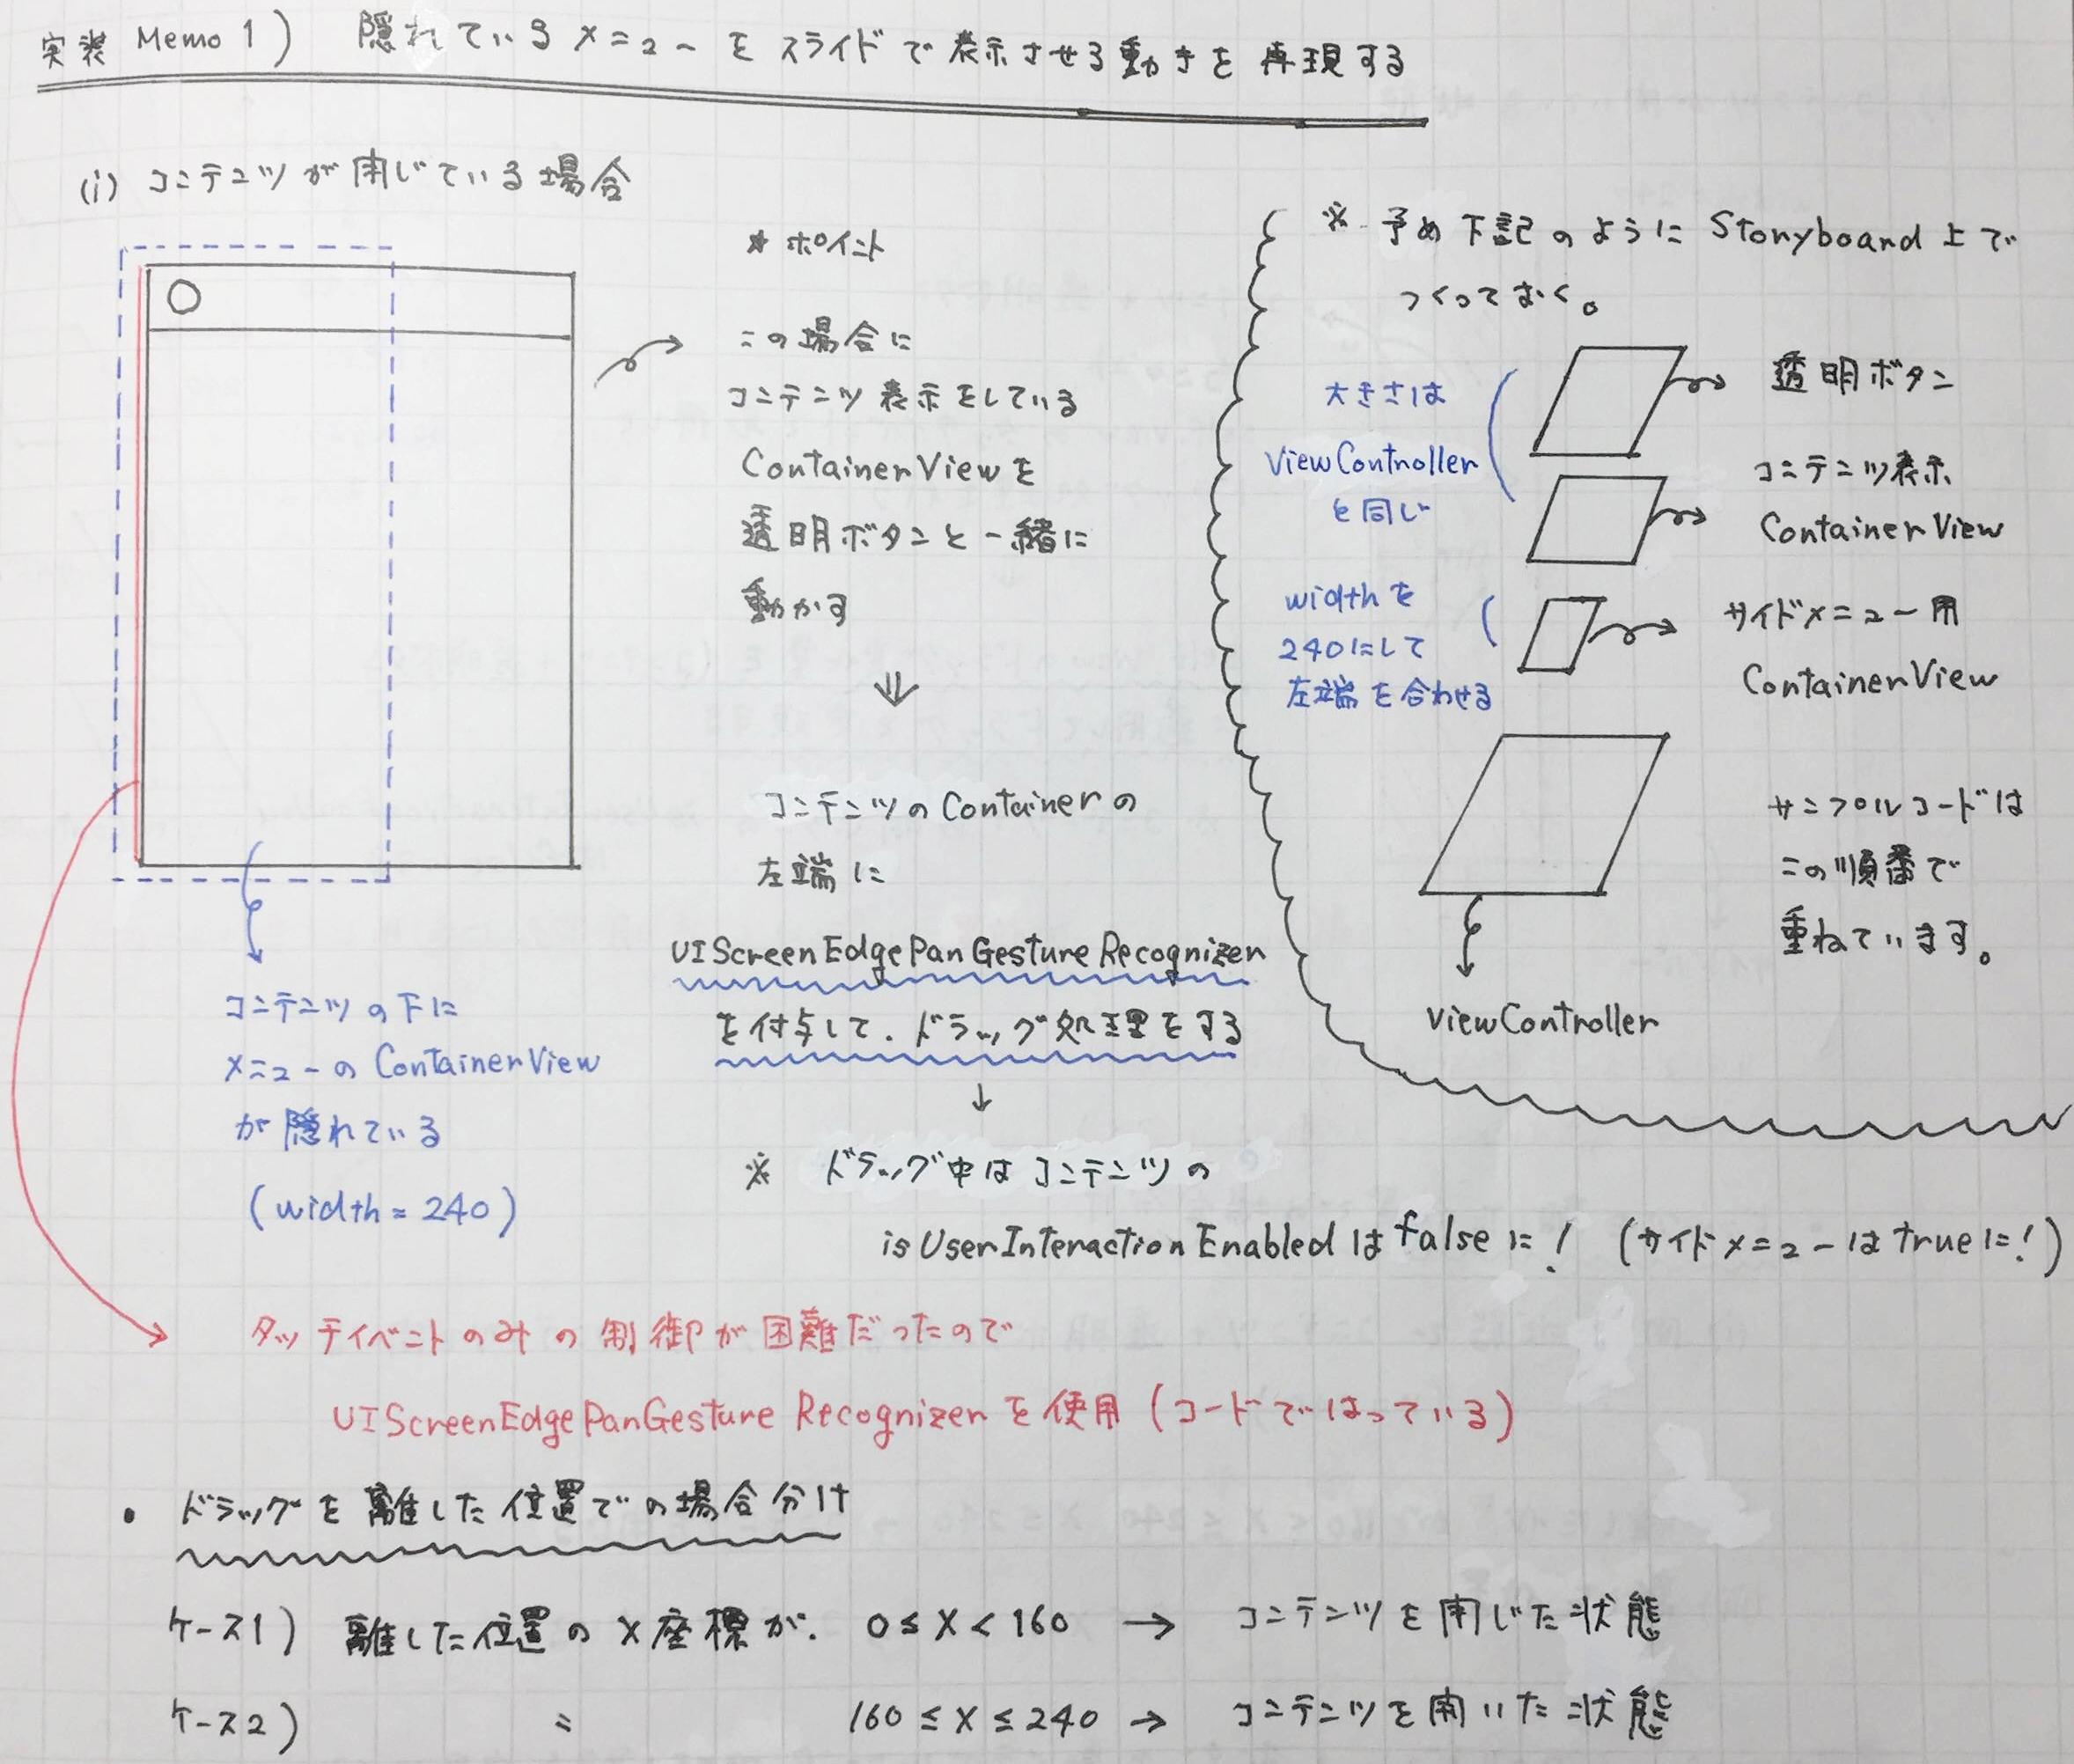 capture-3-1.jpg